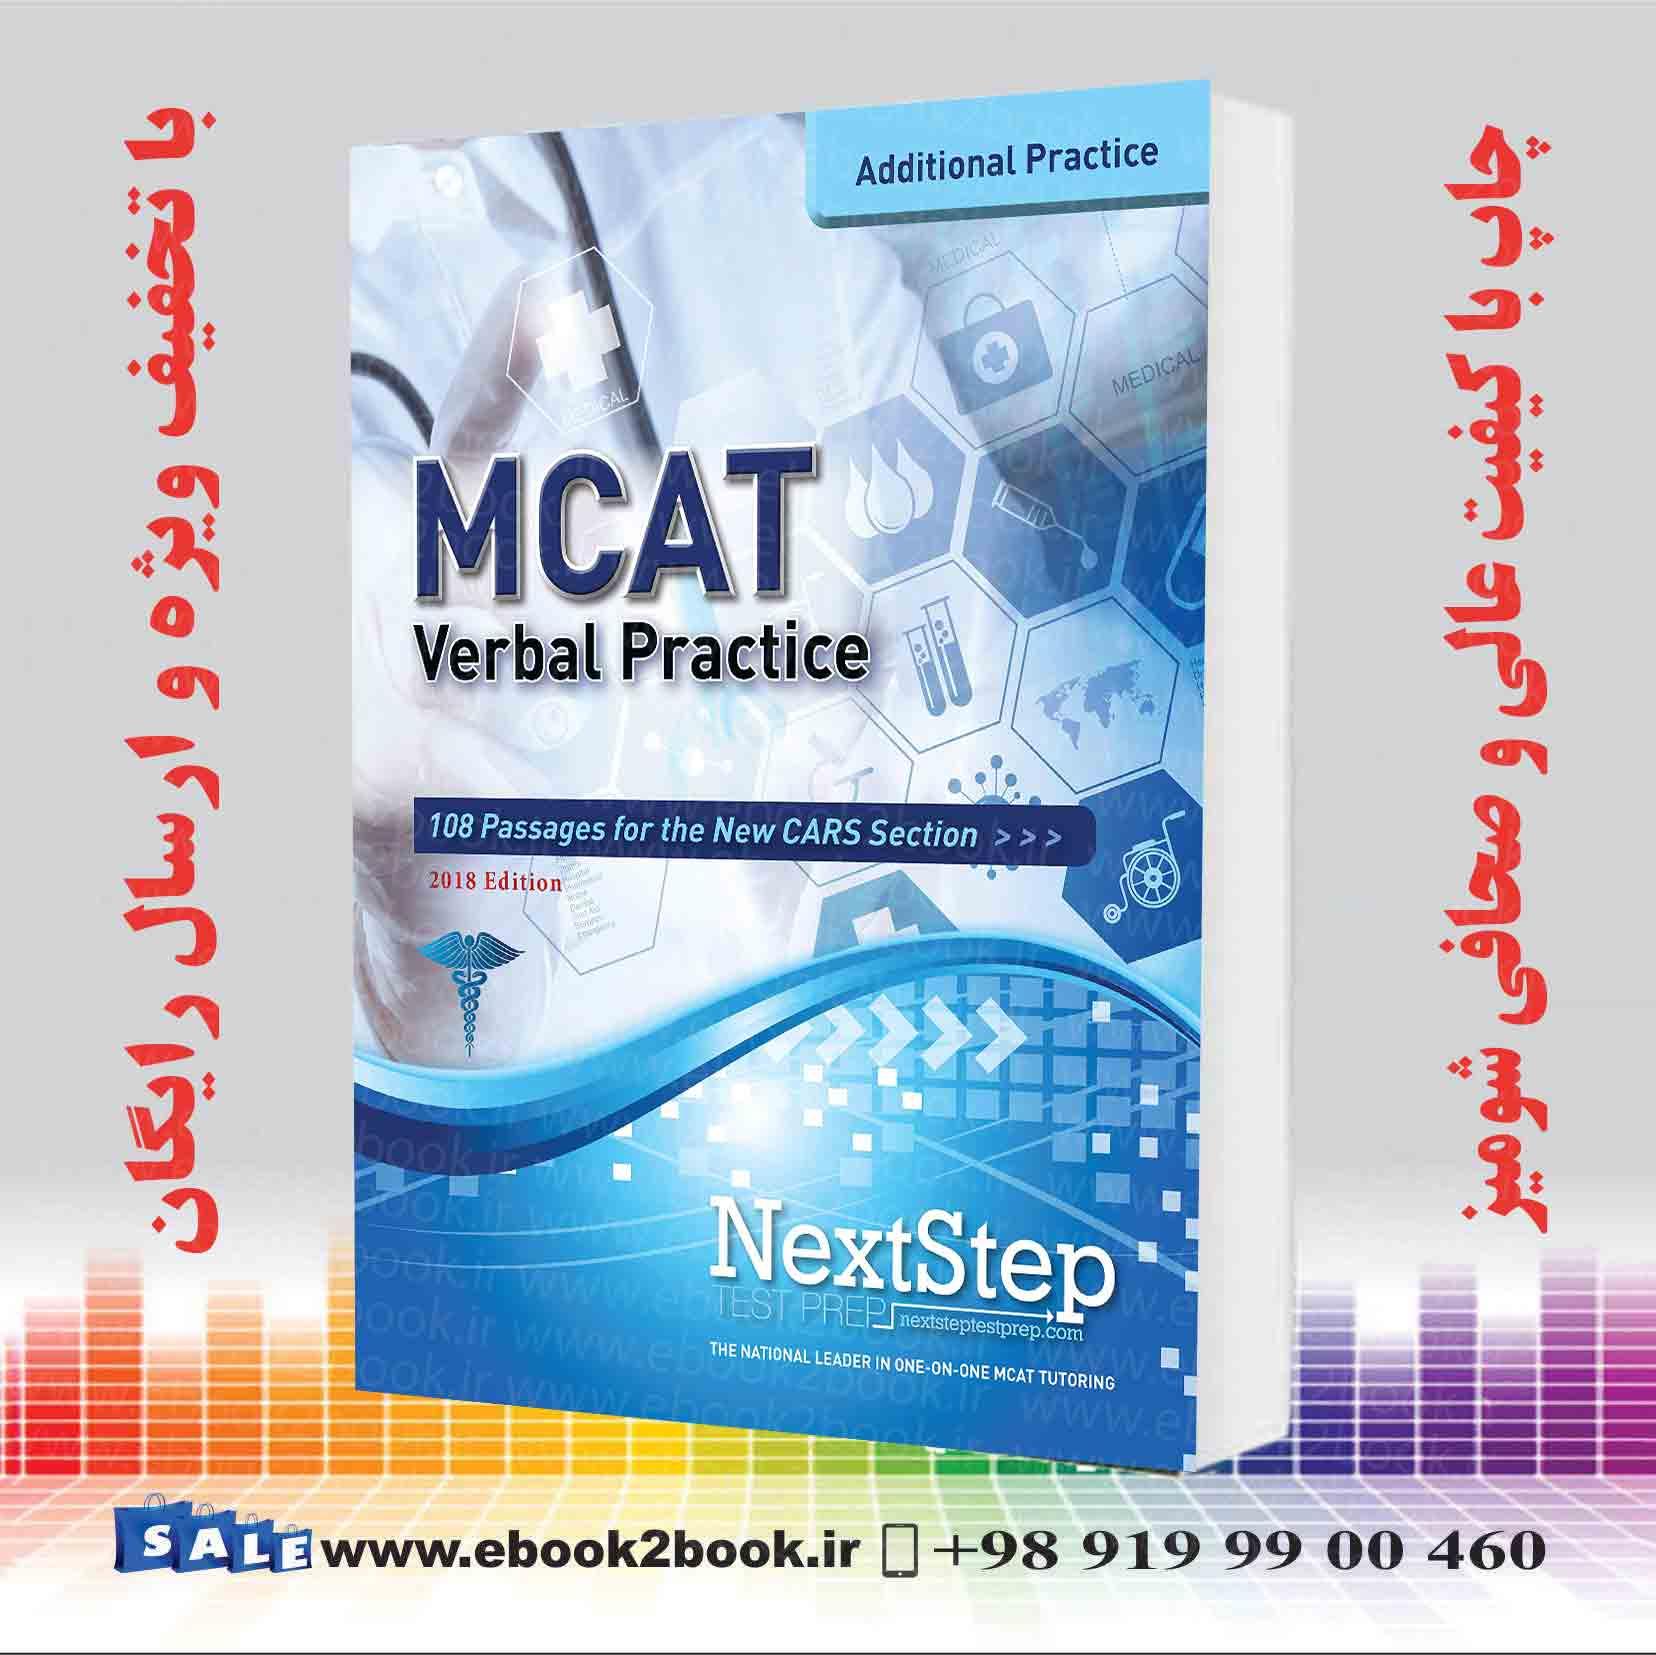 MCAT Verbal Practice - 2018